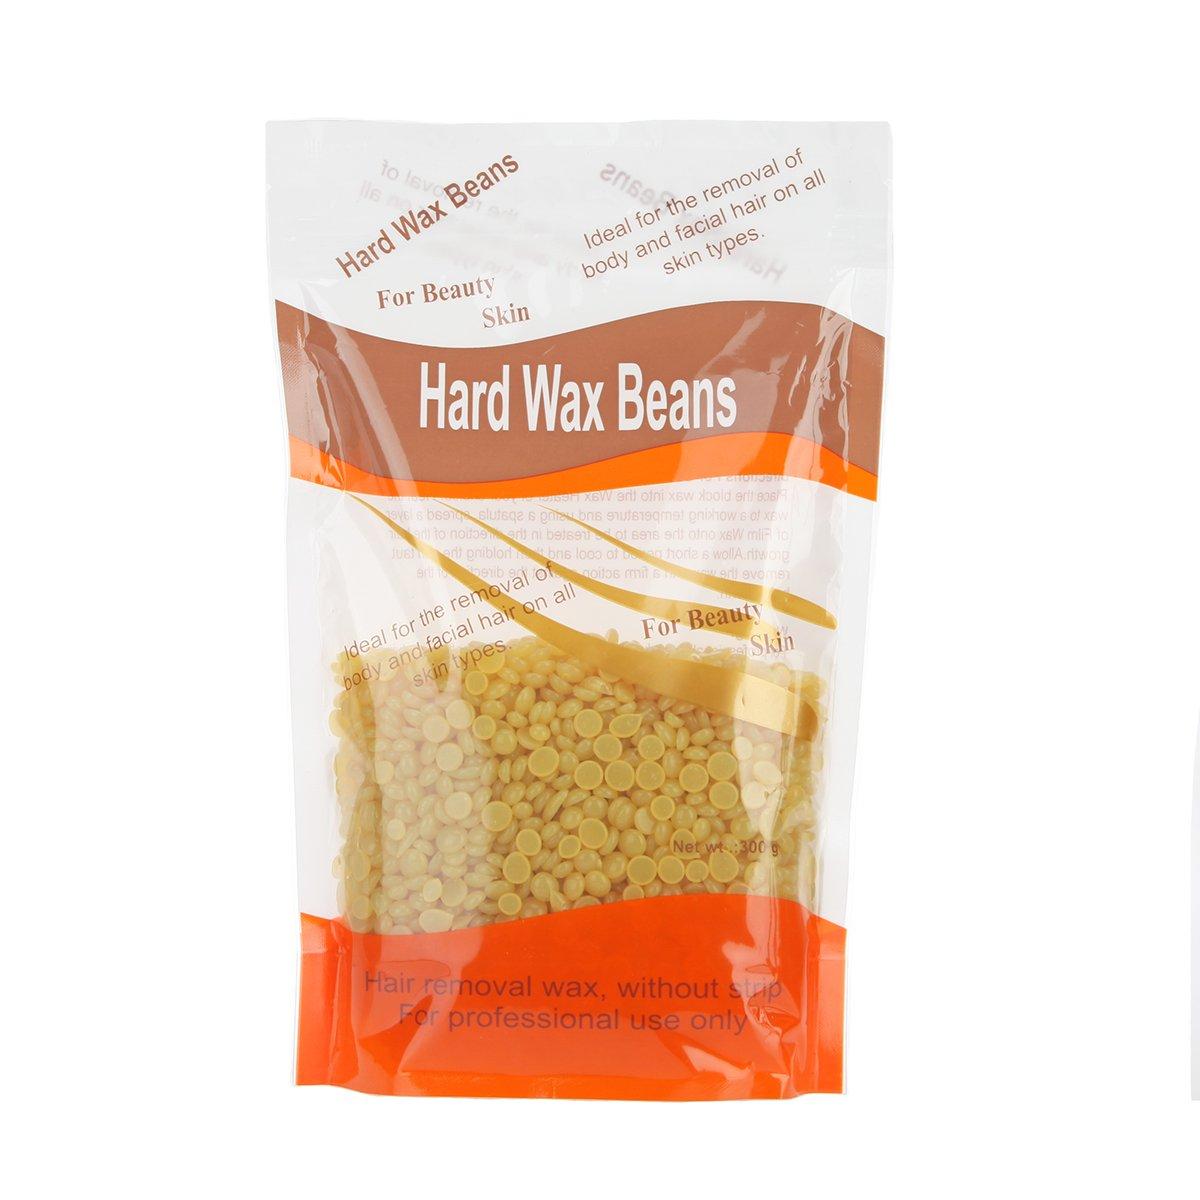 Bonjanvye Hard Wax Hair Removal Wax For Women Face Hair Wax Hard Wax Beans 300g Violet